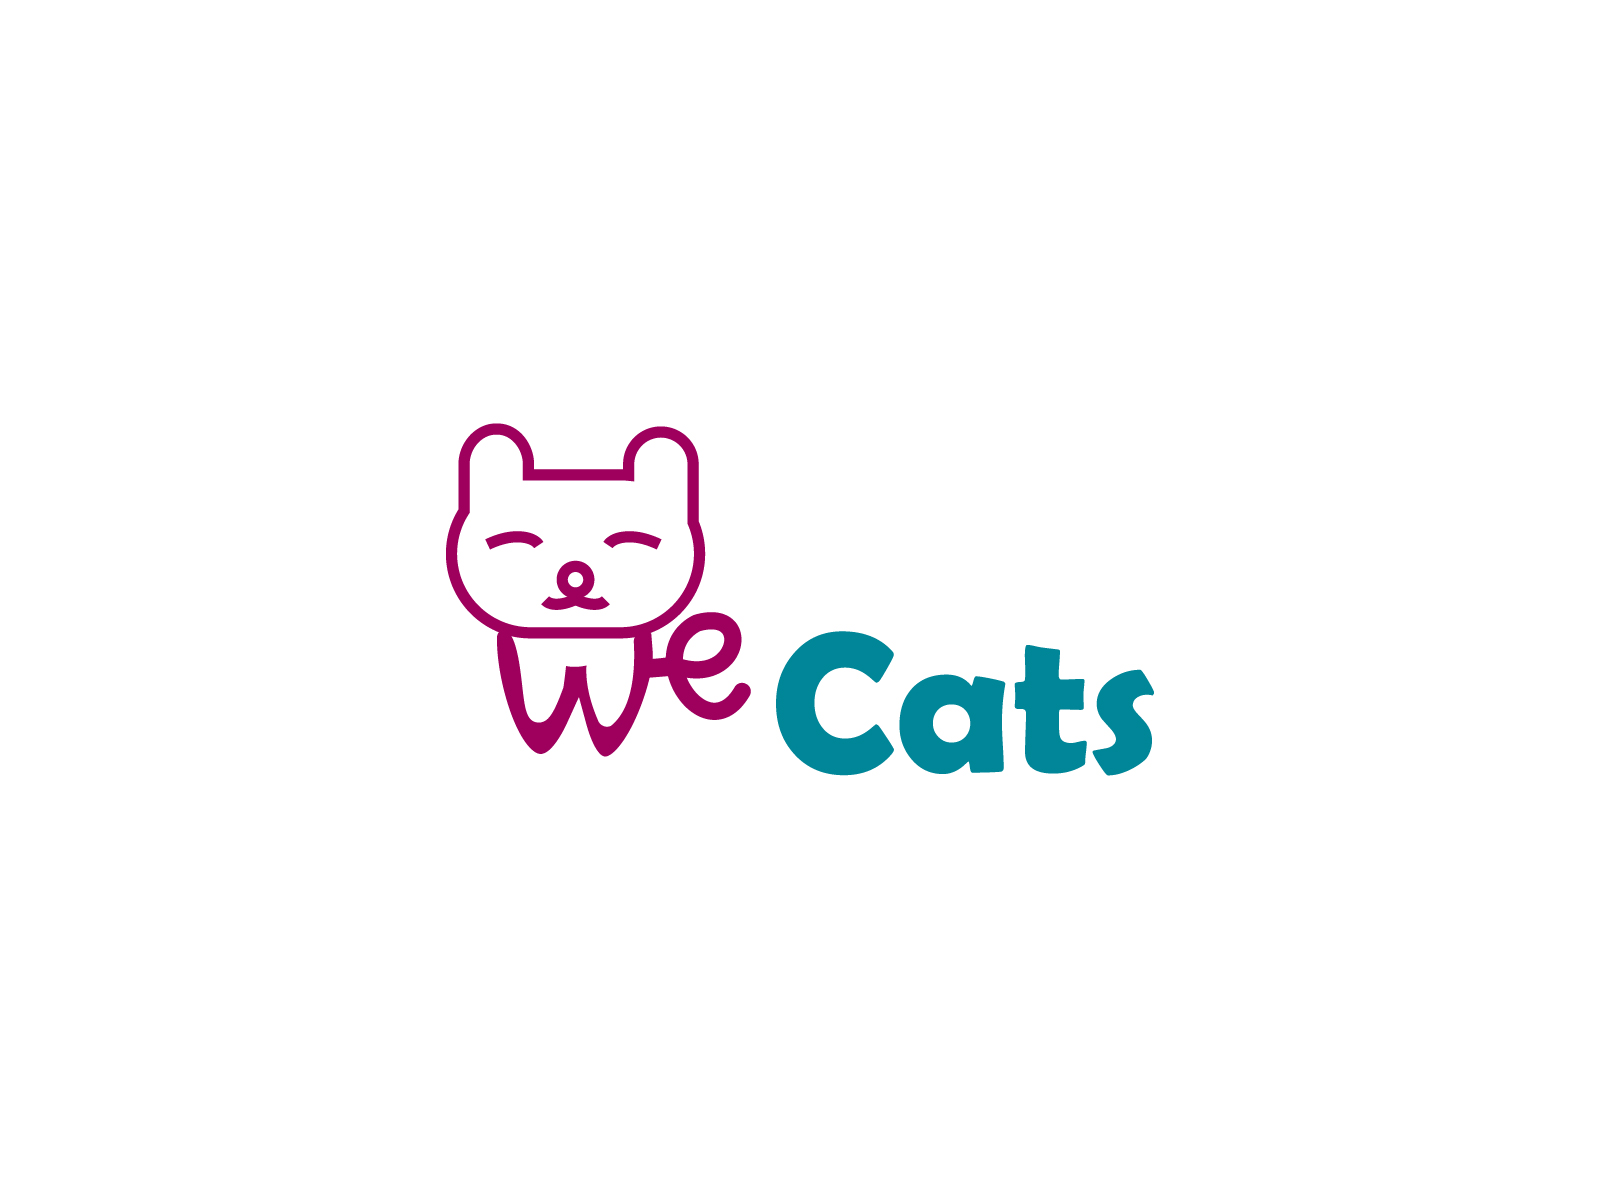 Создание логотипа WeCats фото f_1765f1da6d21d752.jpg